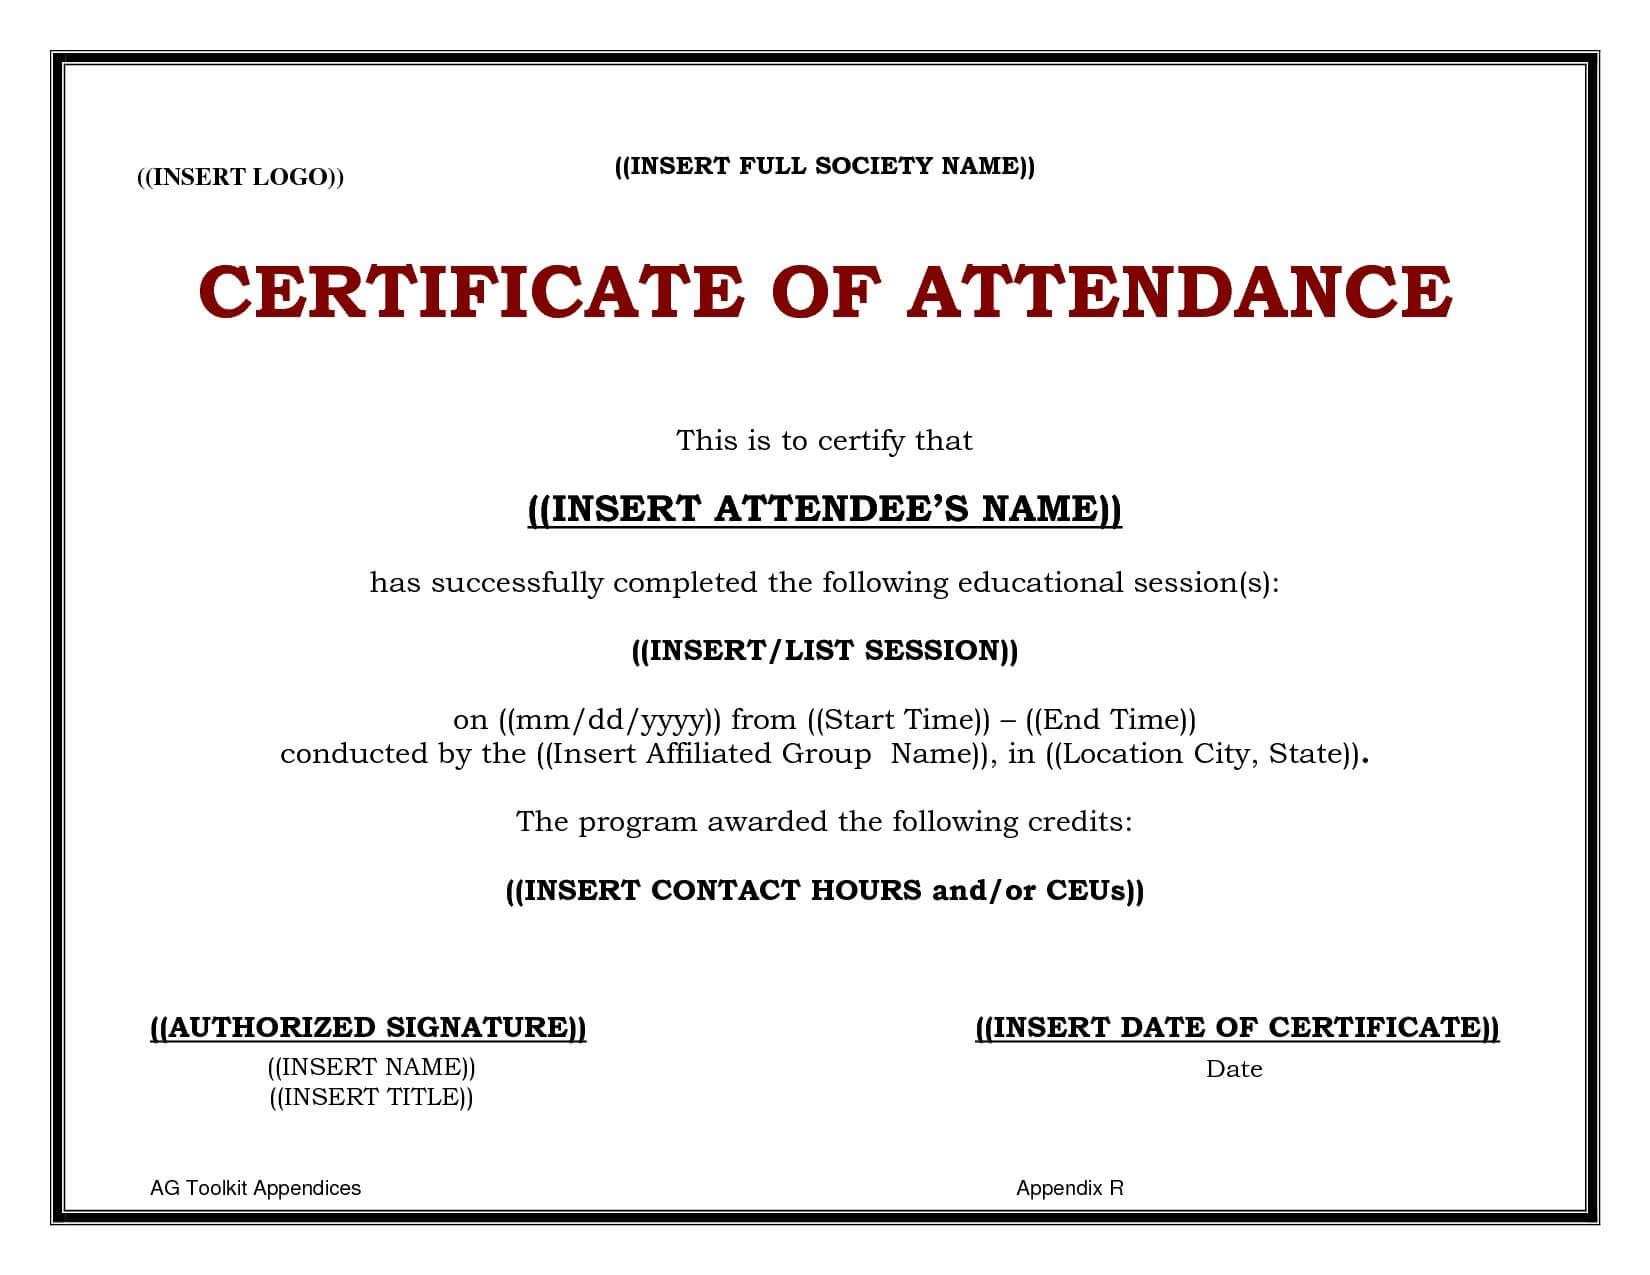 Continuing Education Certificate Template - Carlynstudio for Ceu Certificate Template